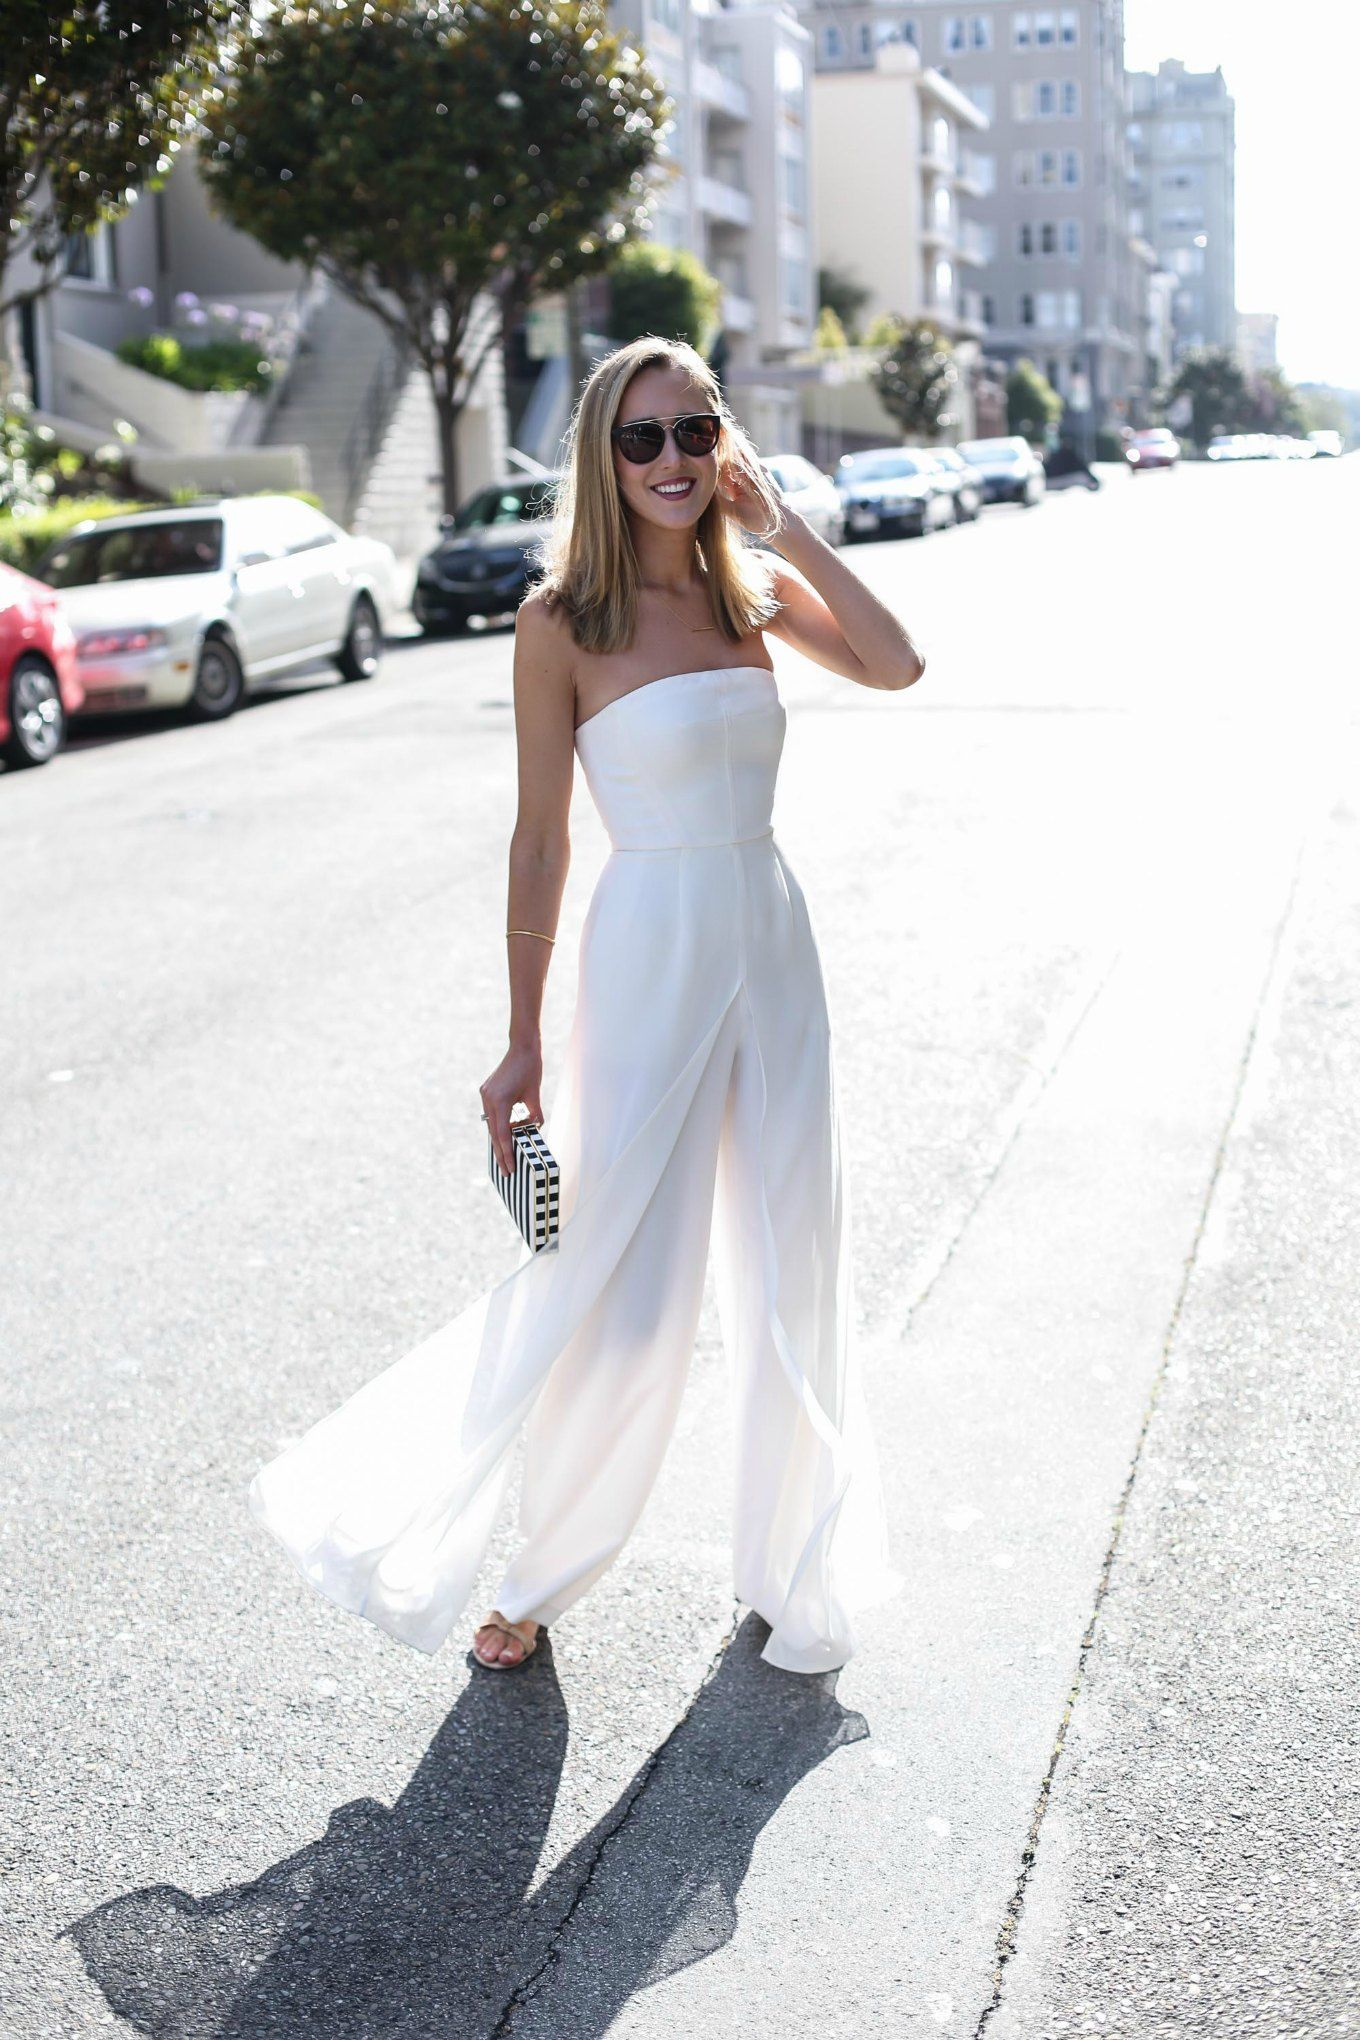 9c353561c9 White Strapless Jumpsuit for Our Anniversary - MEMORANDUM